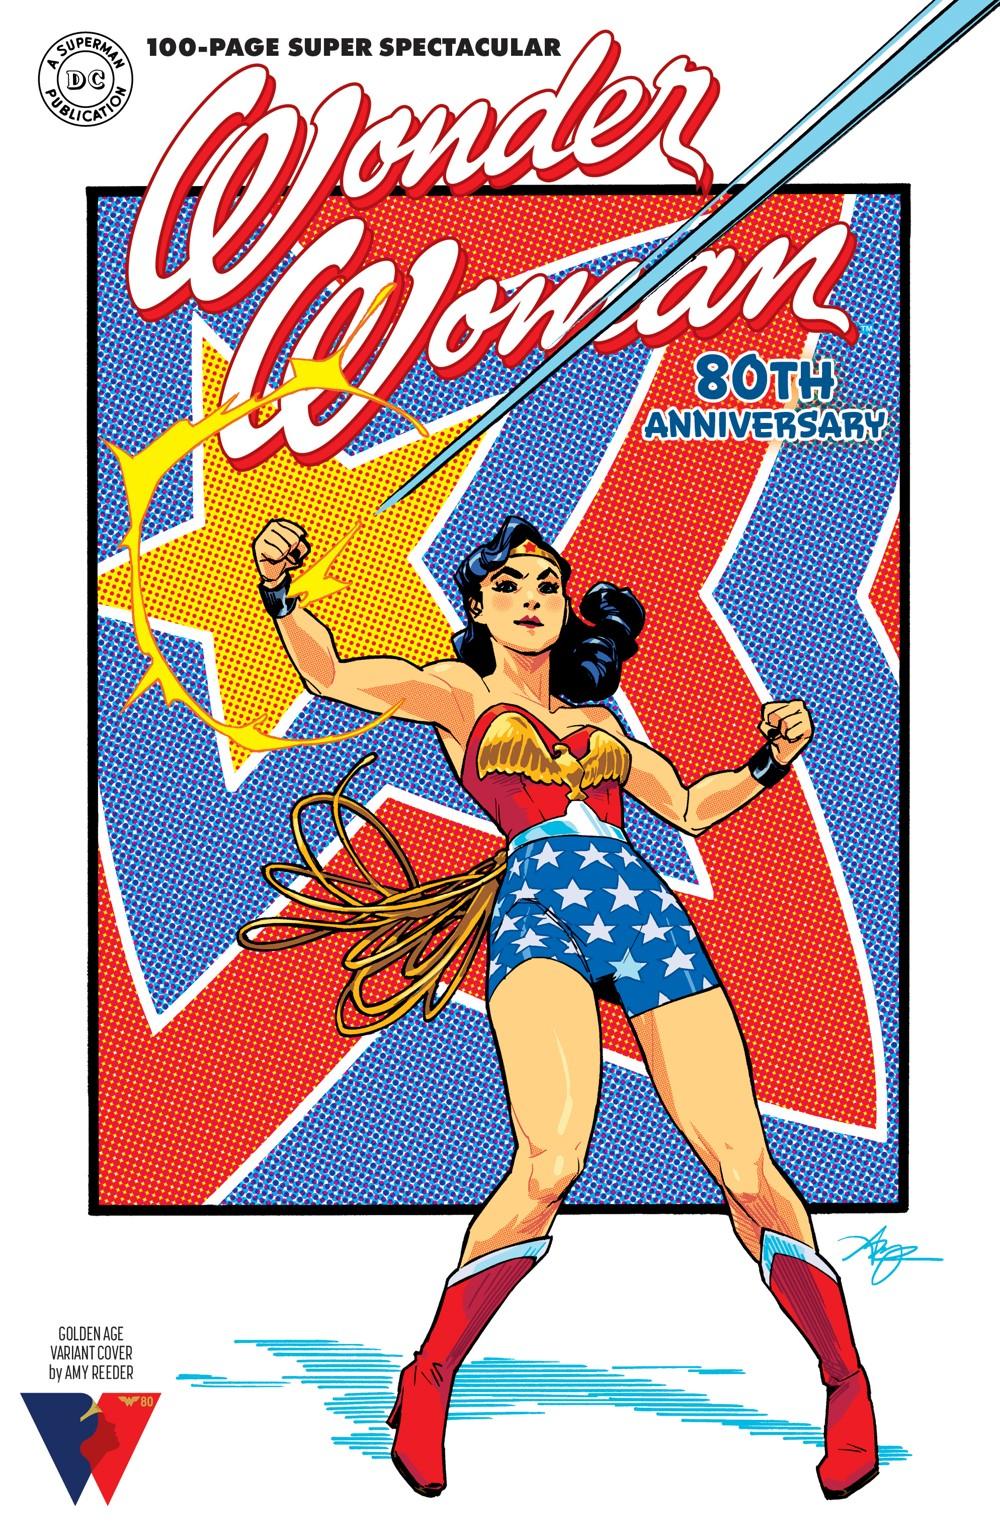 WW80THANN_Cv1_Gldn_Age_var_00161 DC Comics October 2021 Solicitations